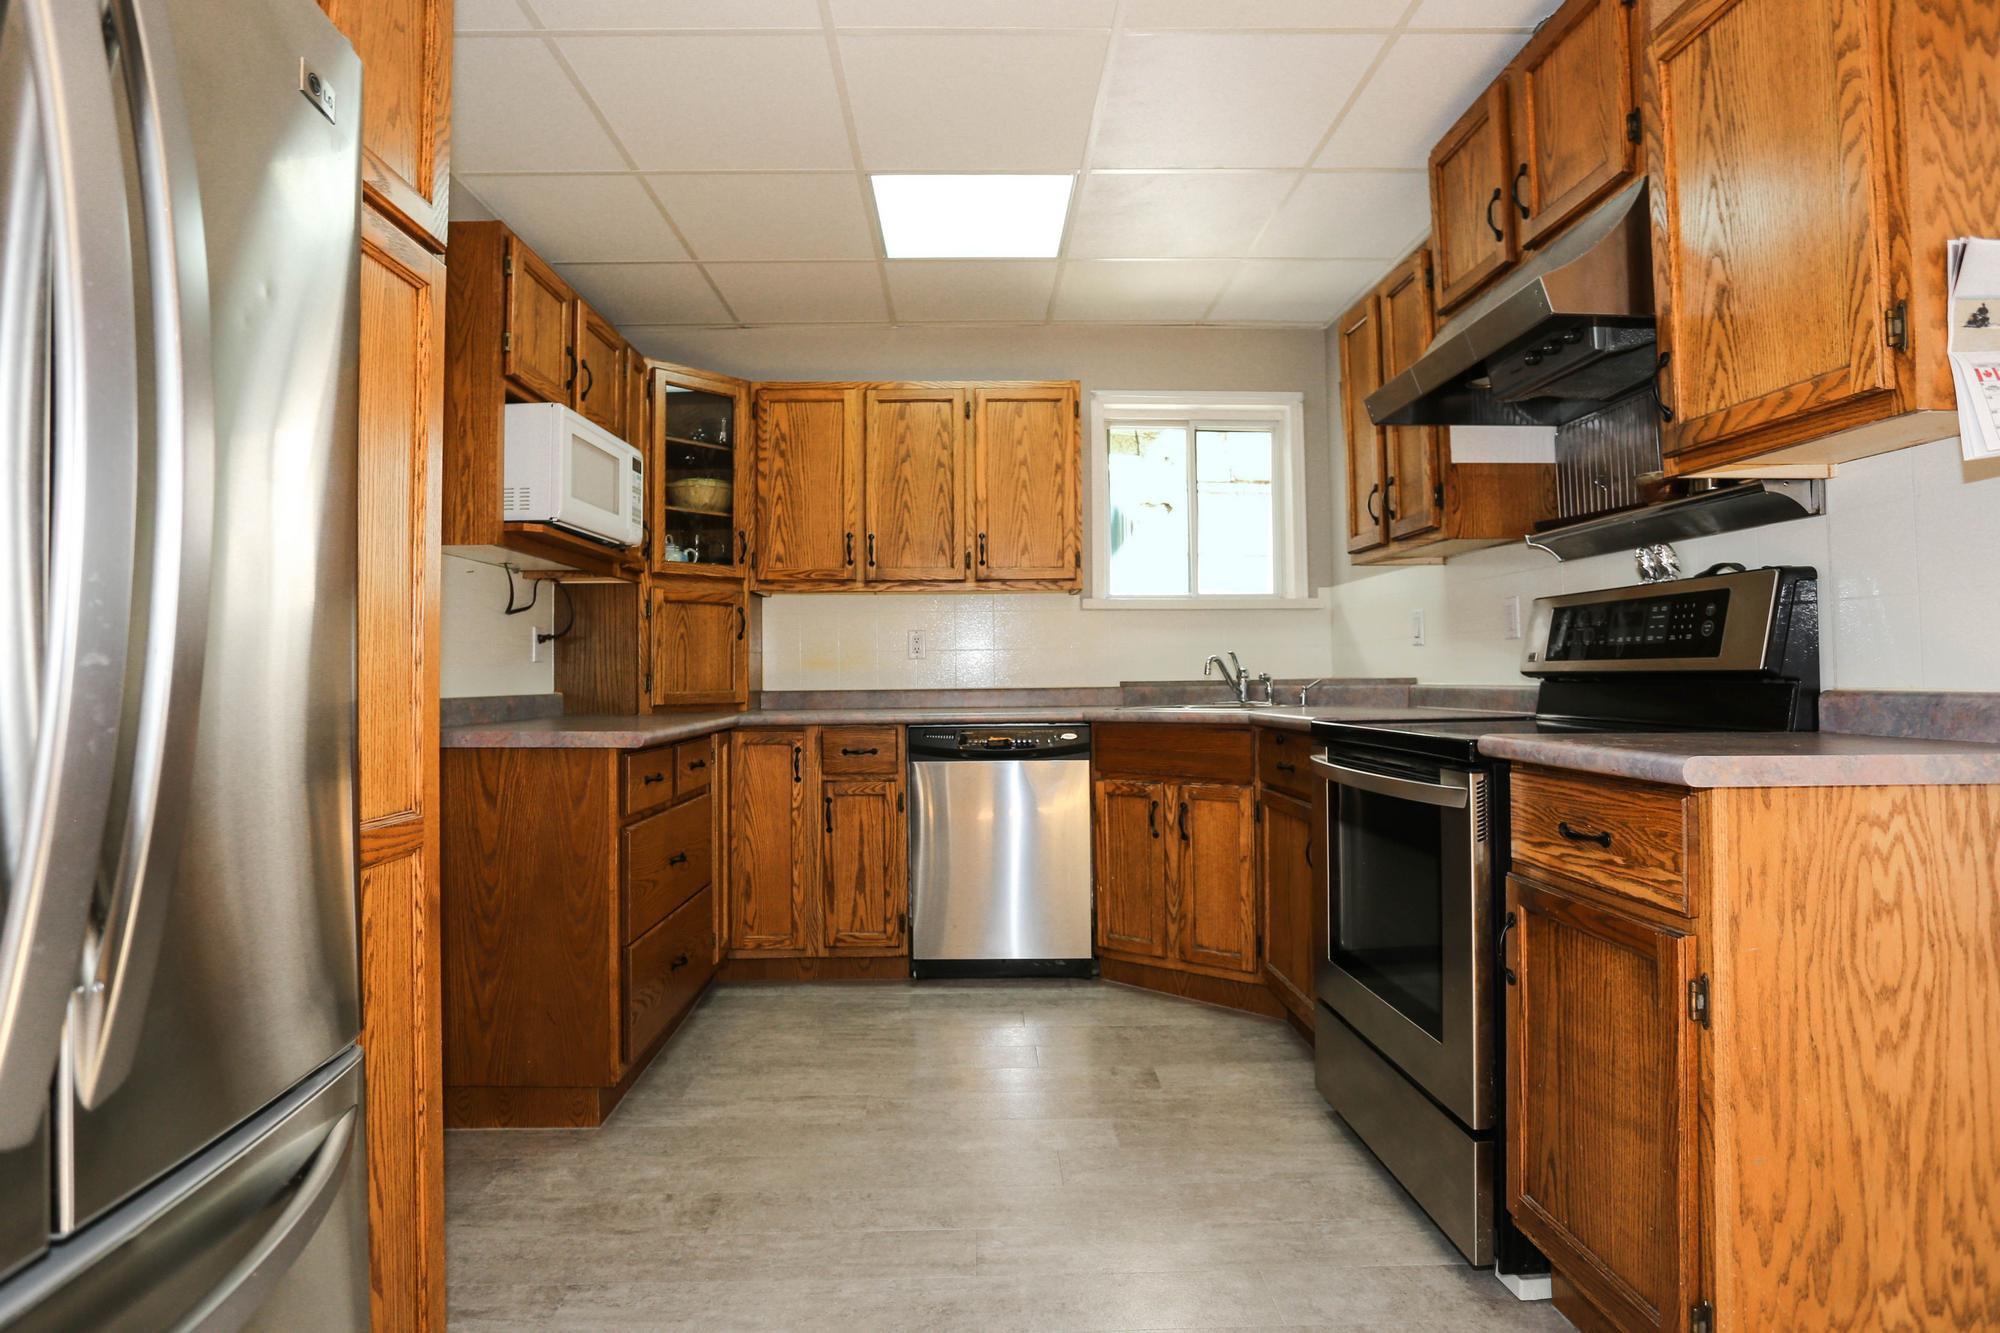 Photo 16: Photos: 105 Evanson Street in Winnipeg: Wolseley Single Family Detached for sale (5B)  : MLS®# 1821900